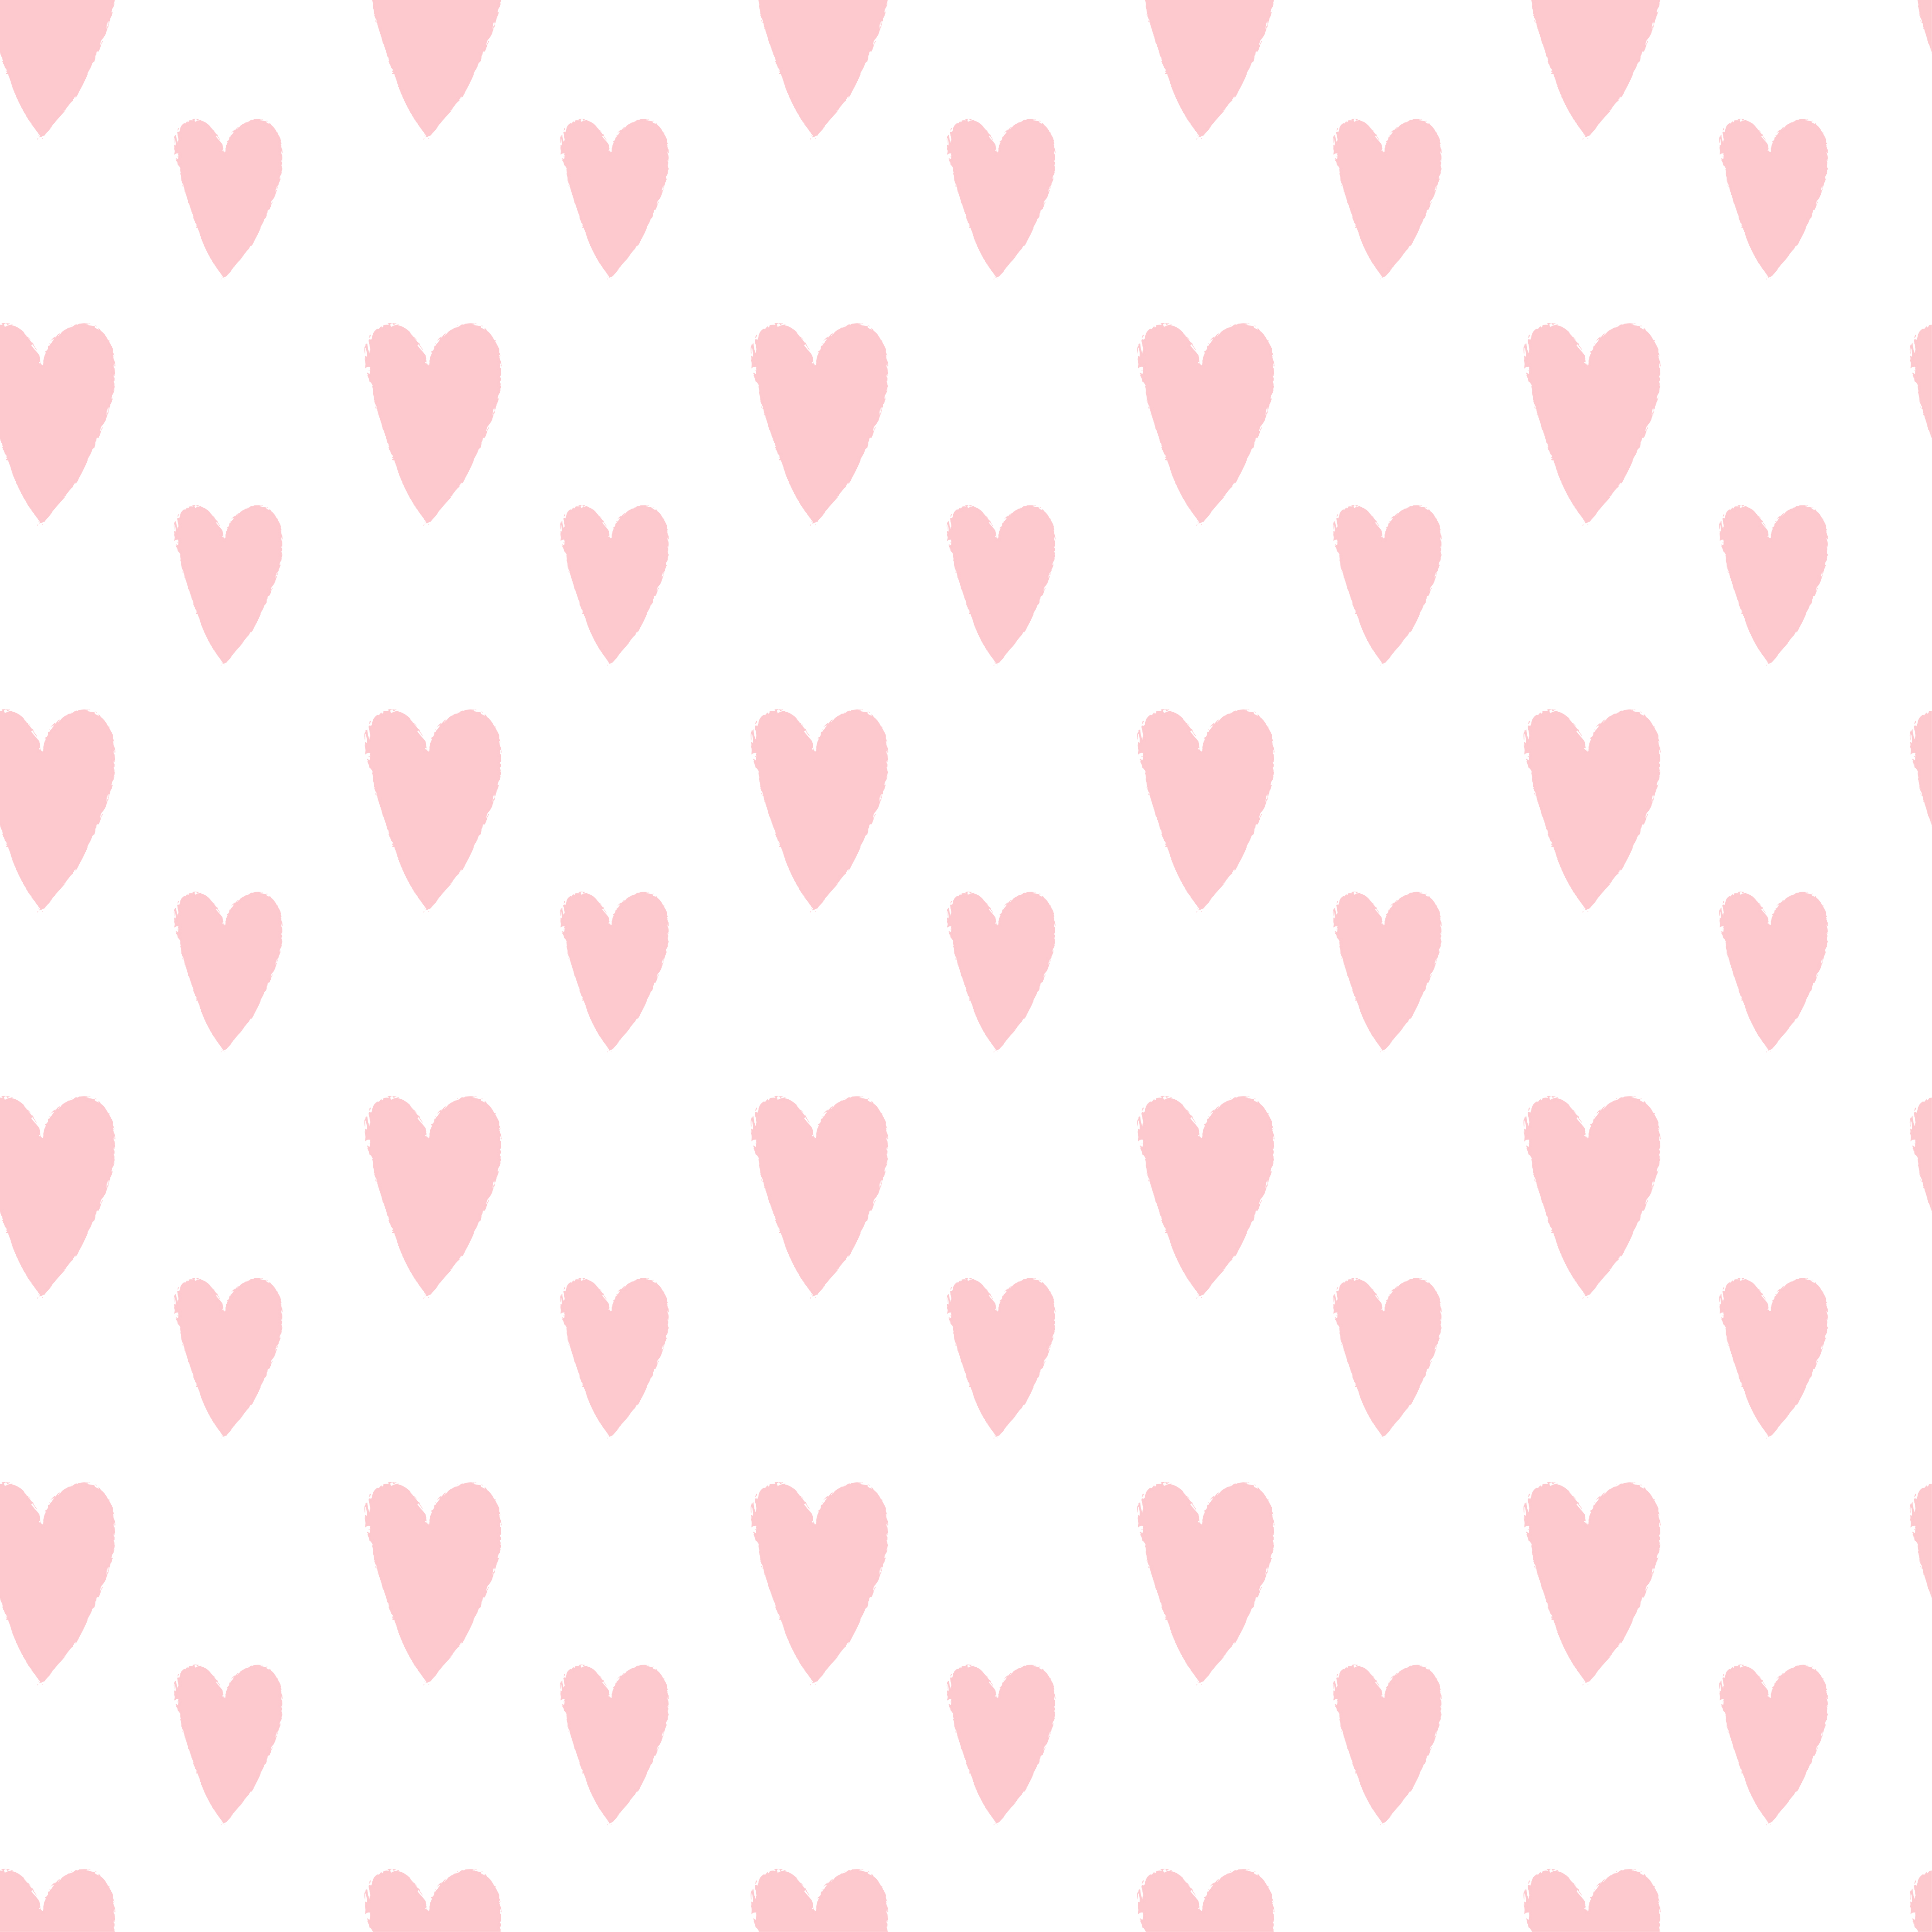 Pink Hearts Casetify Iphone Art Design Cute Heart Illustration Pink Heart Background Heart Wallpaper Pink Heart